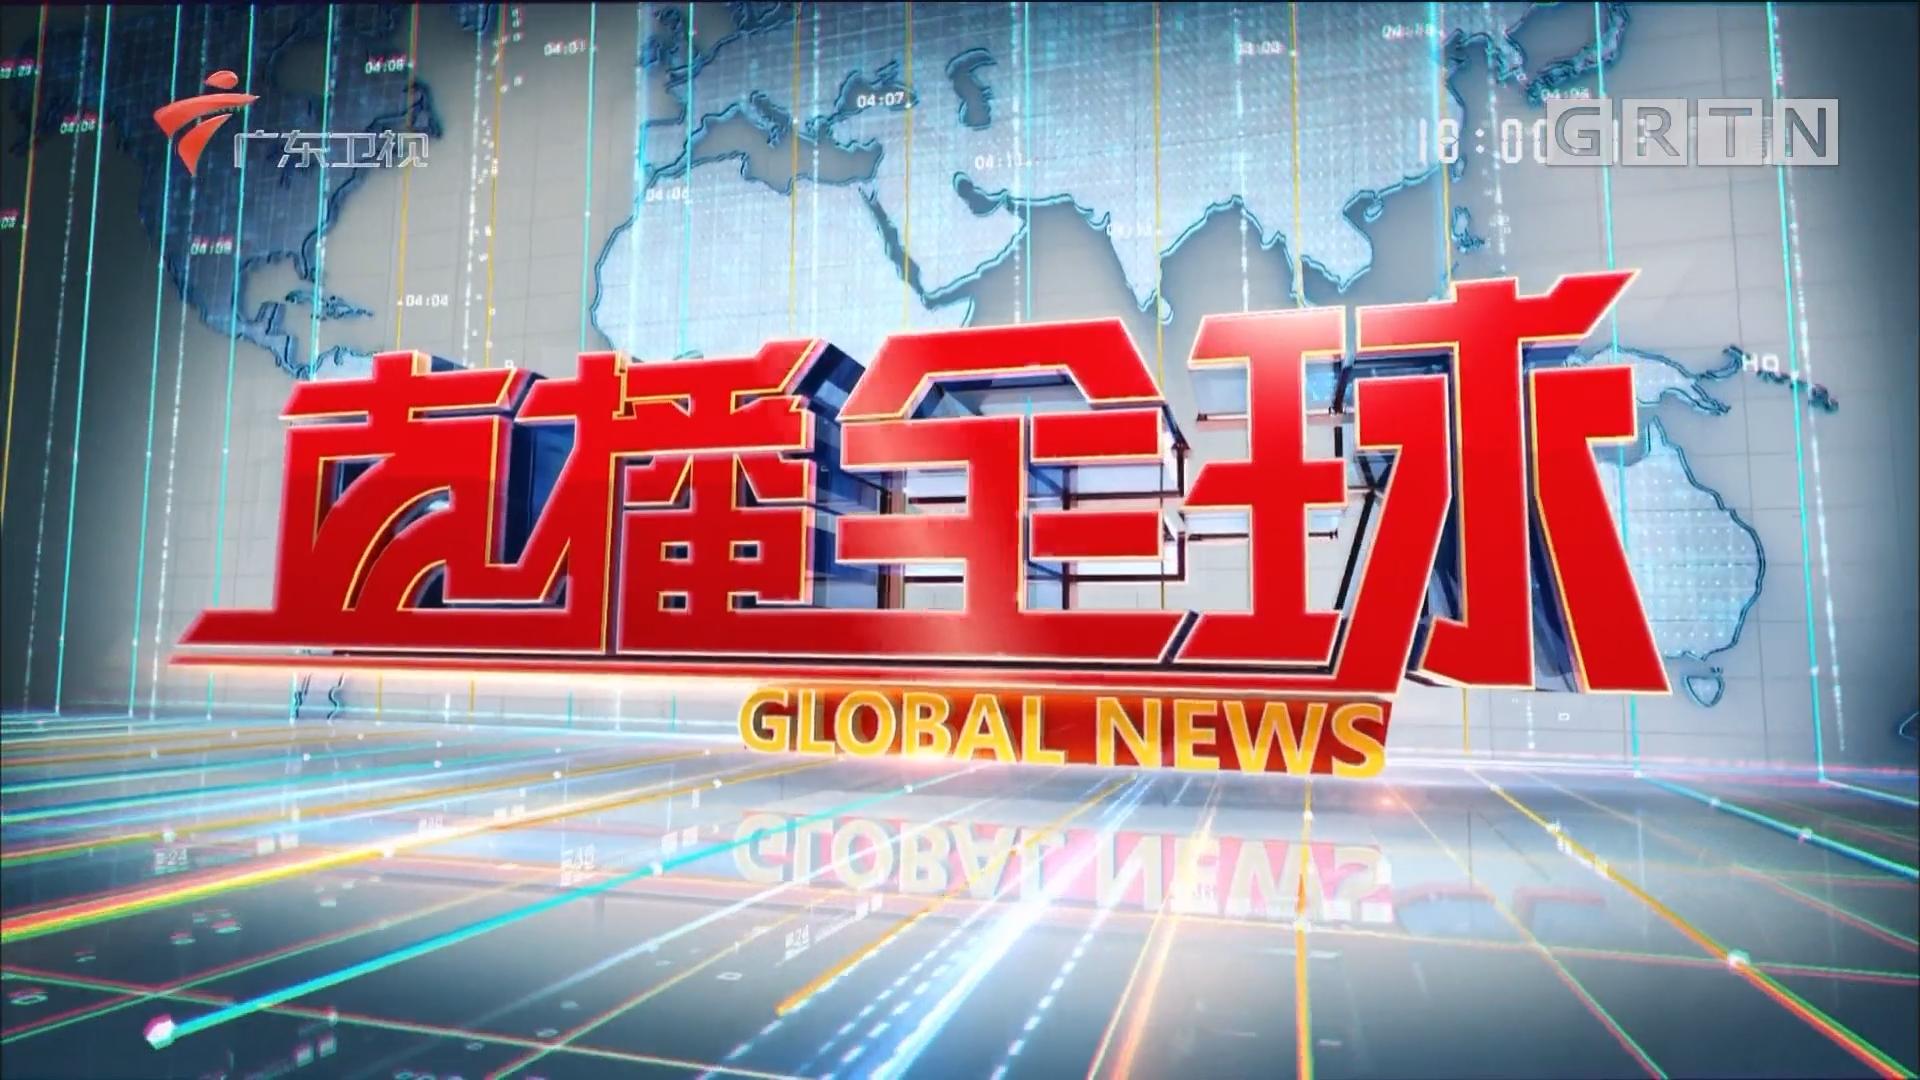 [HD][2017-08-09]直播全球:九寨沟县7.0级地震 已致19死247伤 习近平对九寨沟7.0级地震作出重要指示